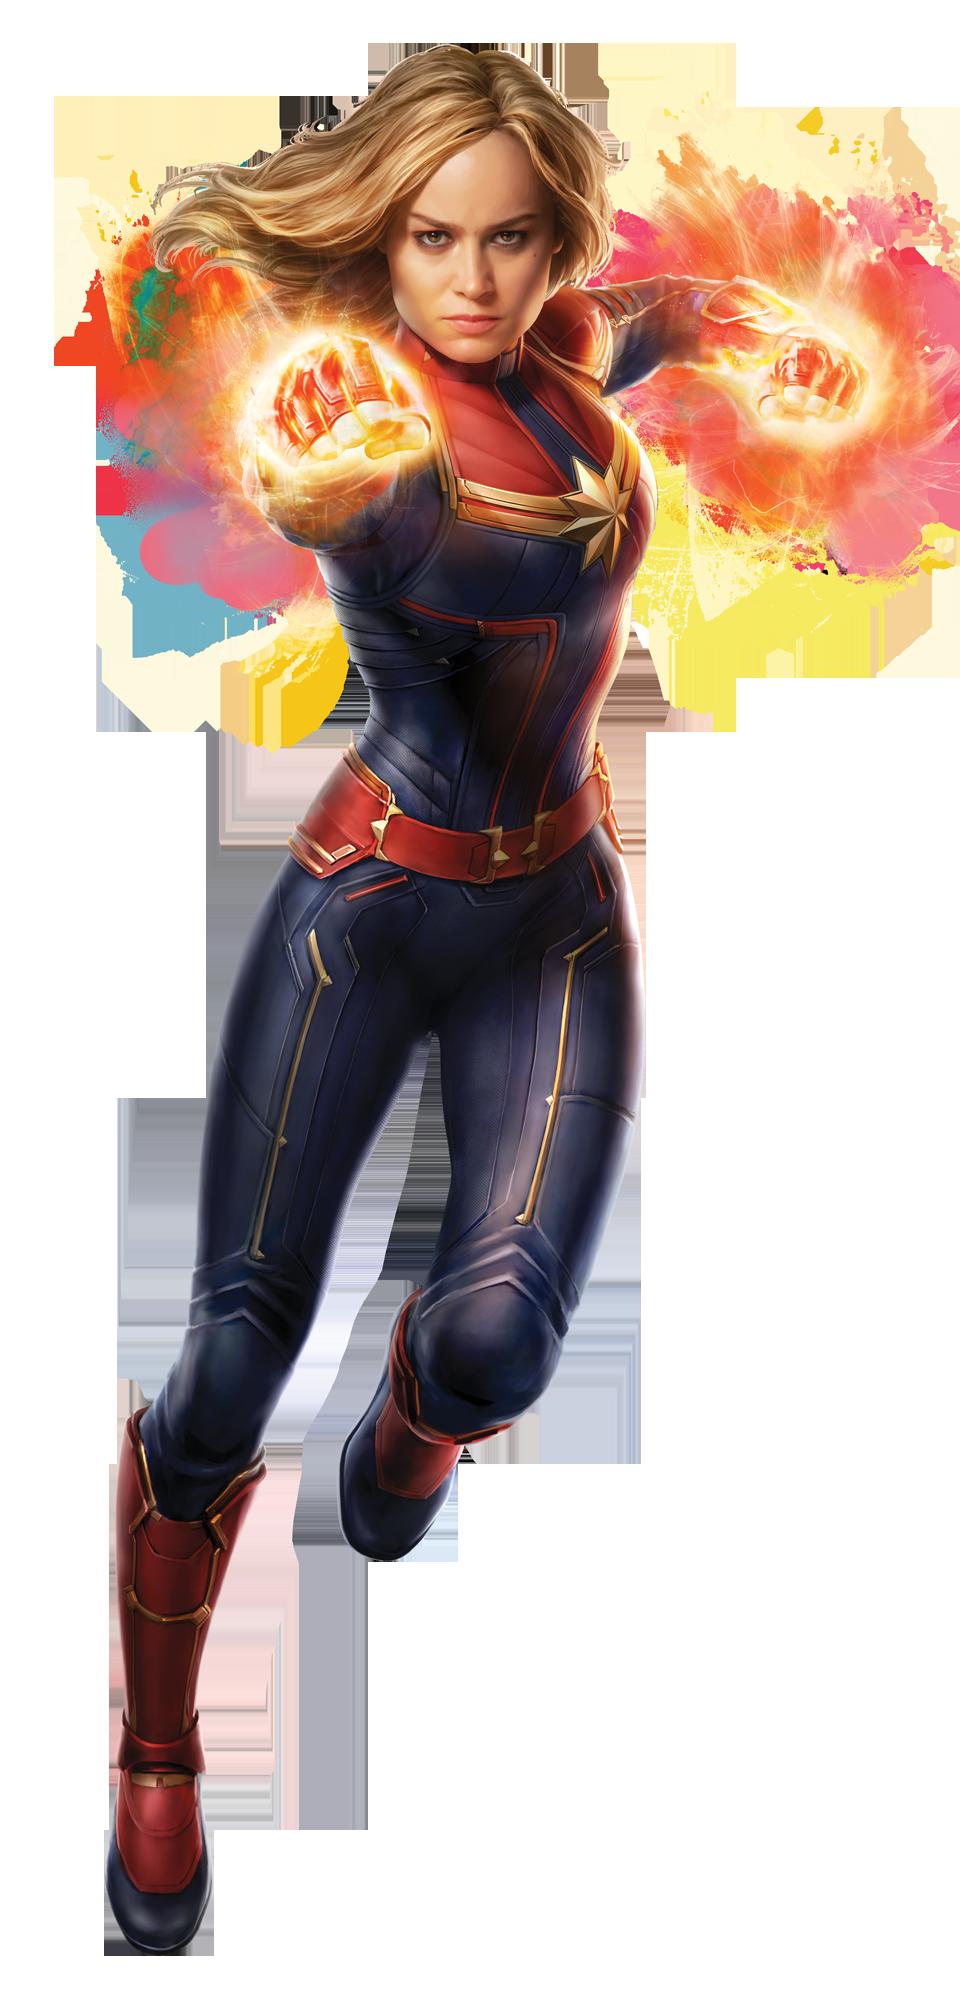 Captain Marvel (Marvel Cinematic Universe).